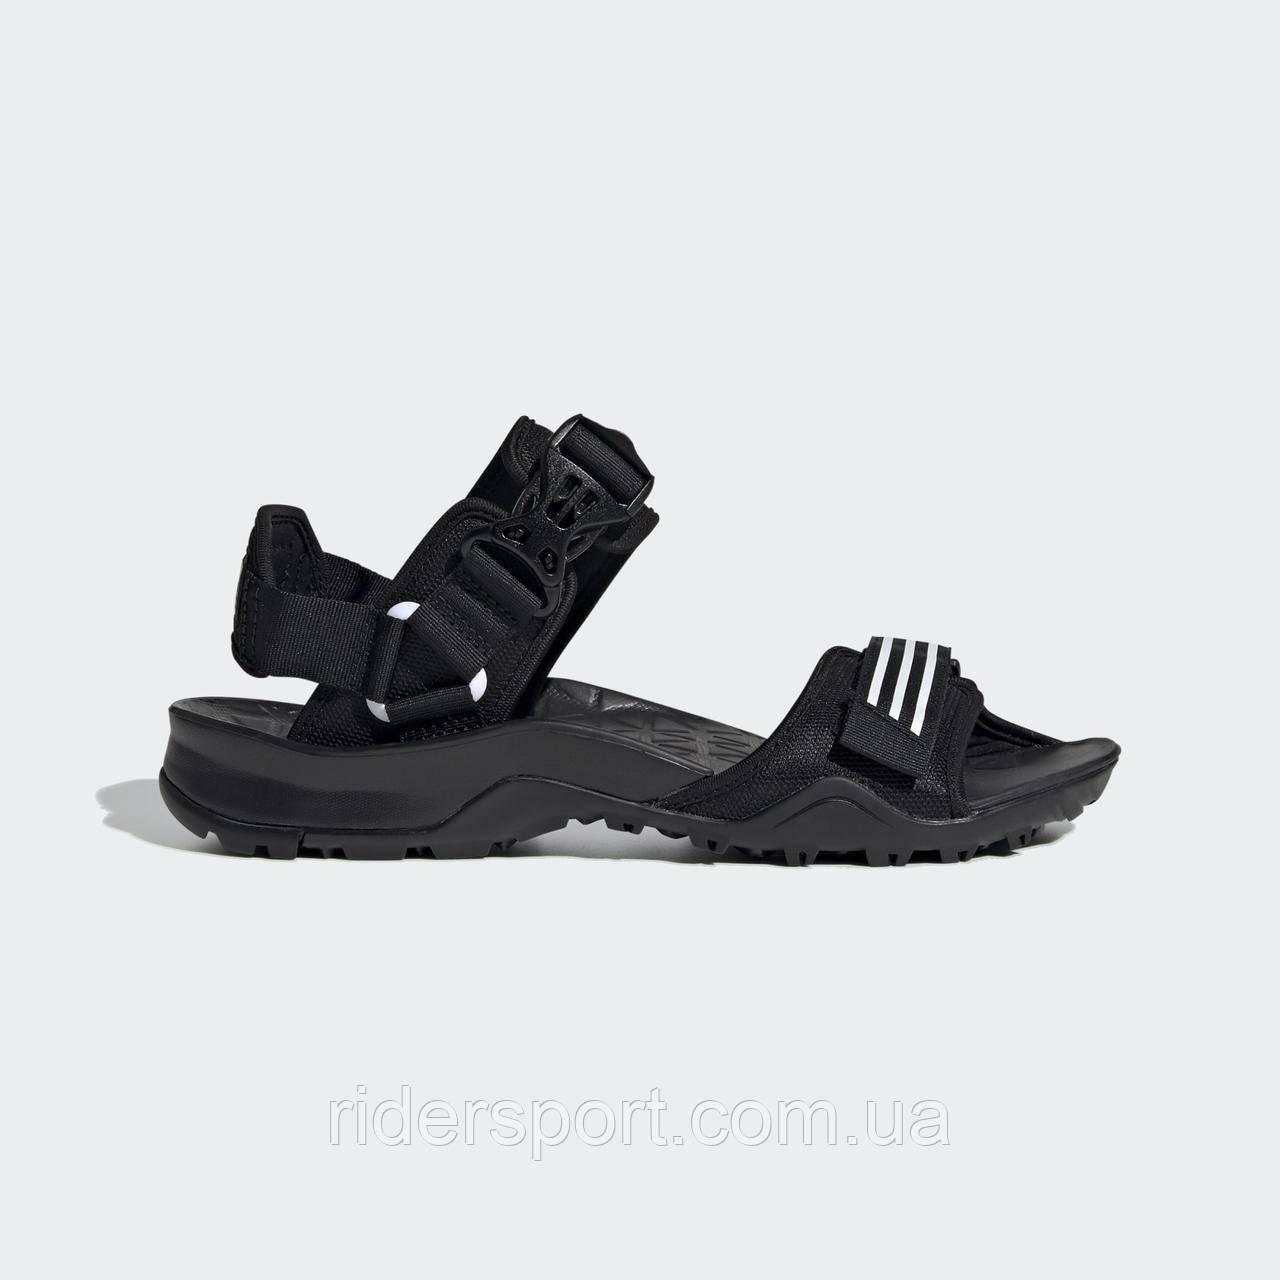 Сандалі Adidas CYPREX ULTRA SANDAL EF0016